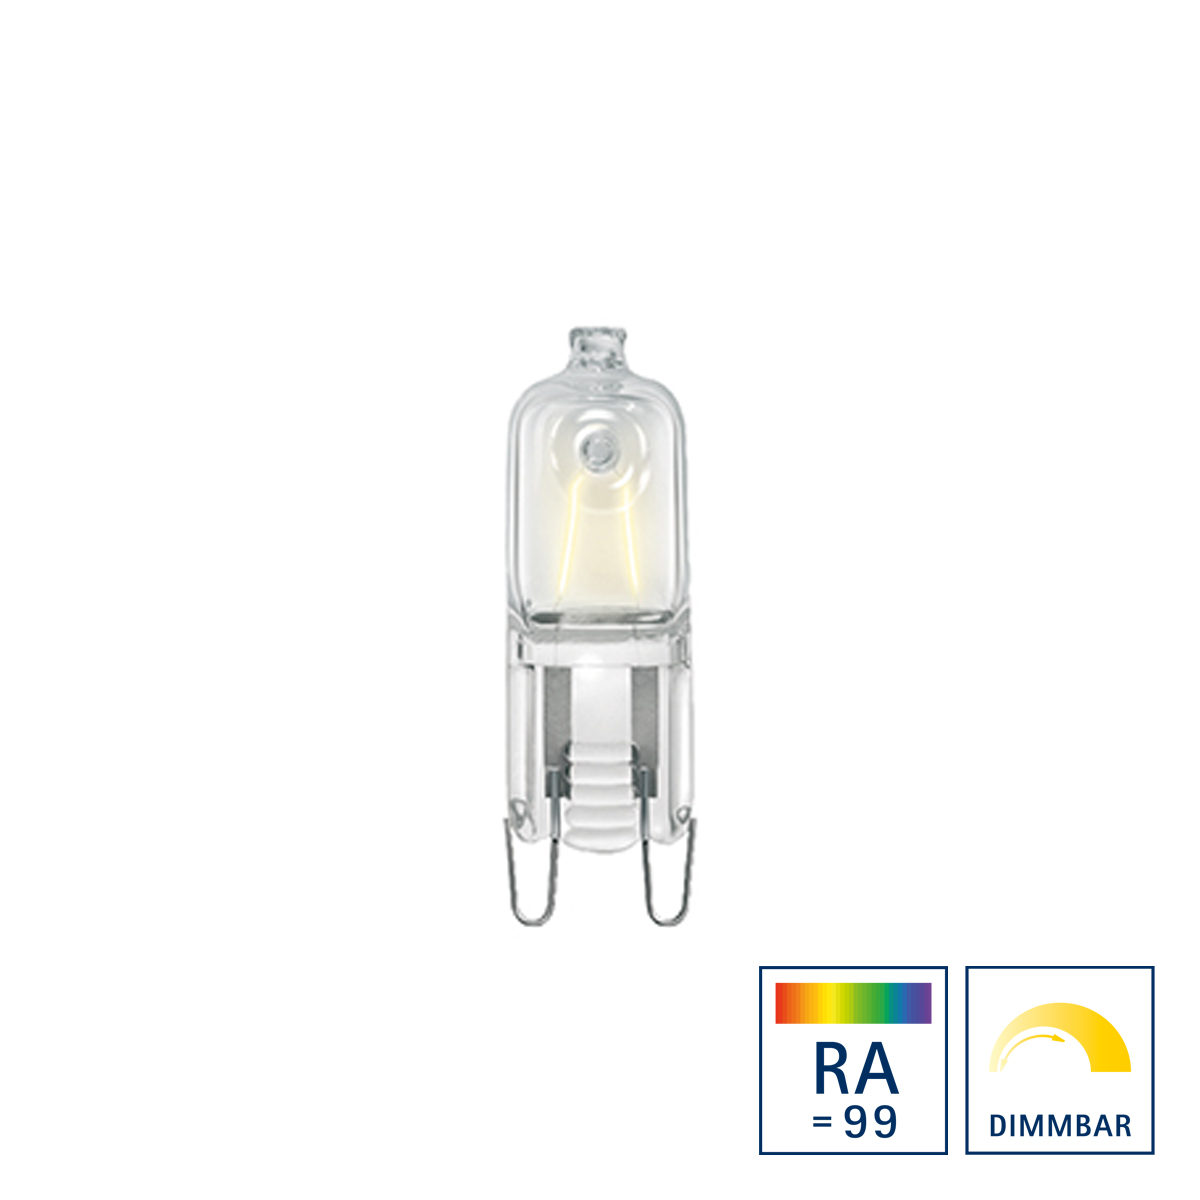 Sigor Halogenlampe 230 V G9, 60 W